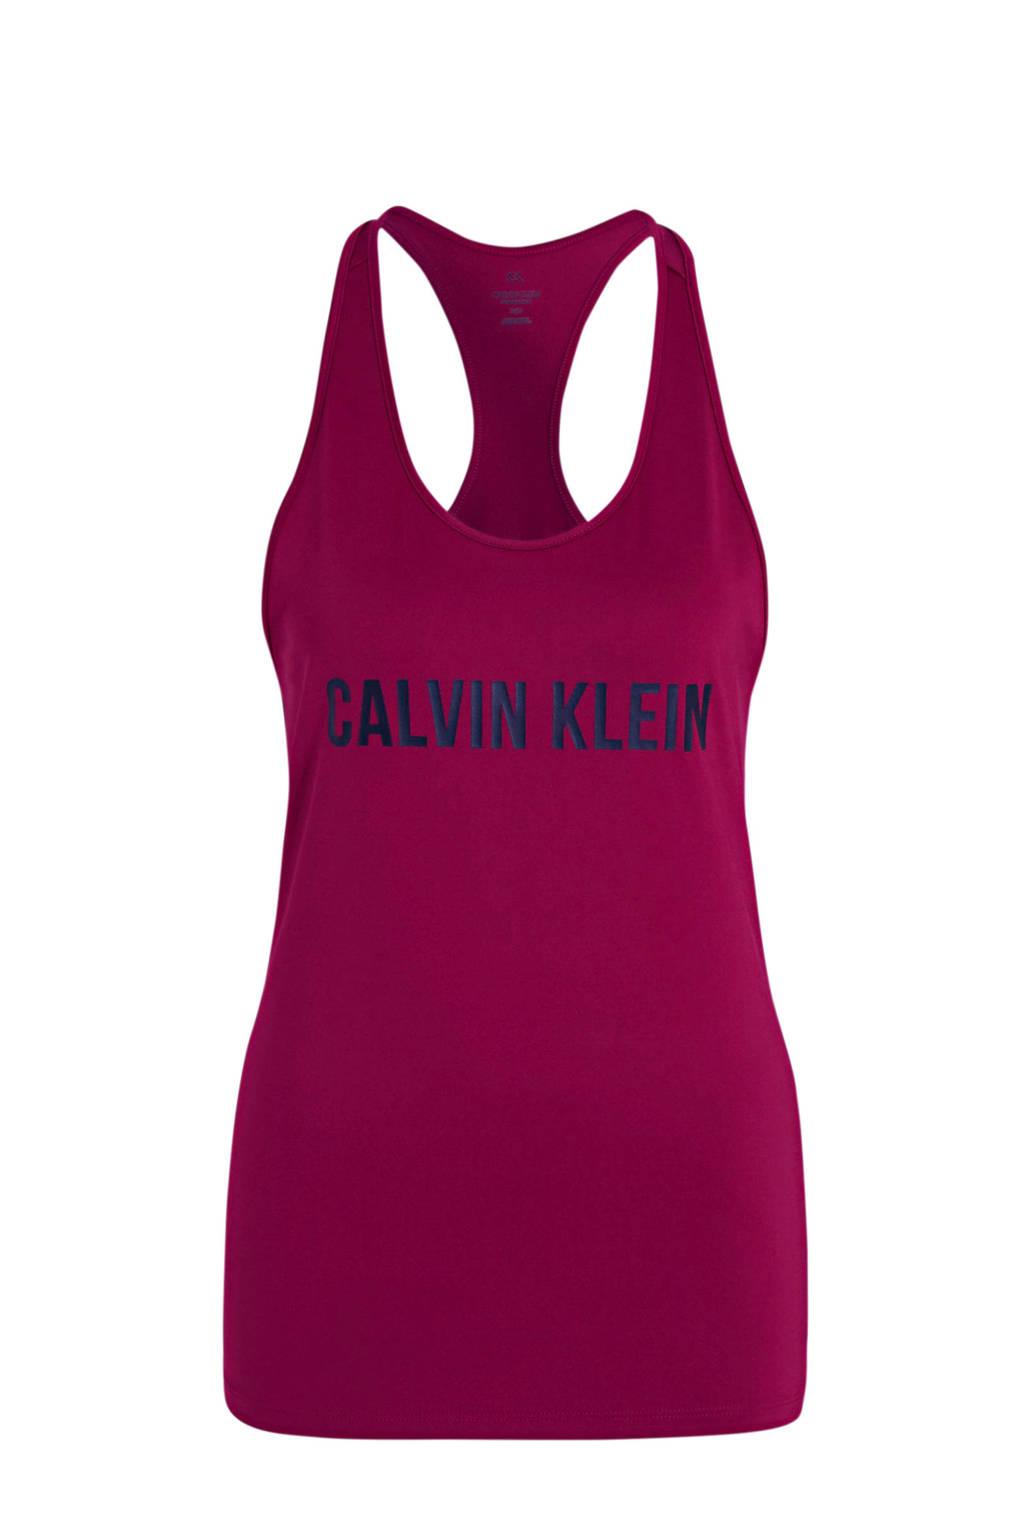 CALVIN KLEIN PERFORMANCE sporttop roze, Roze